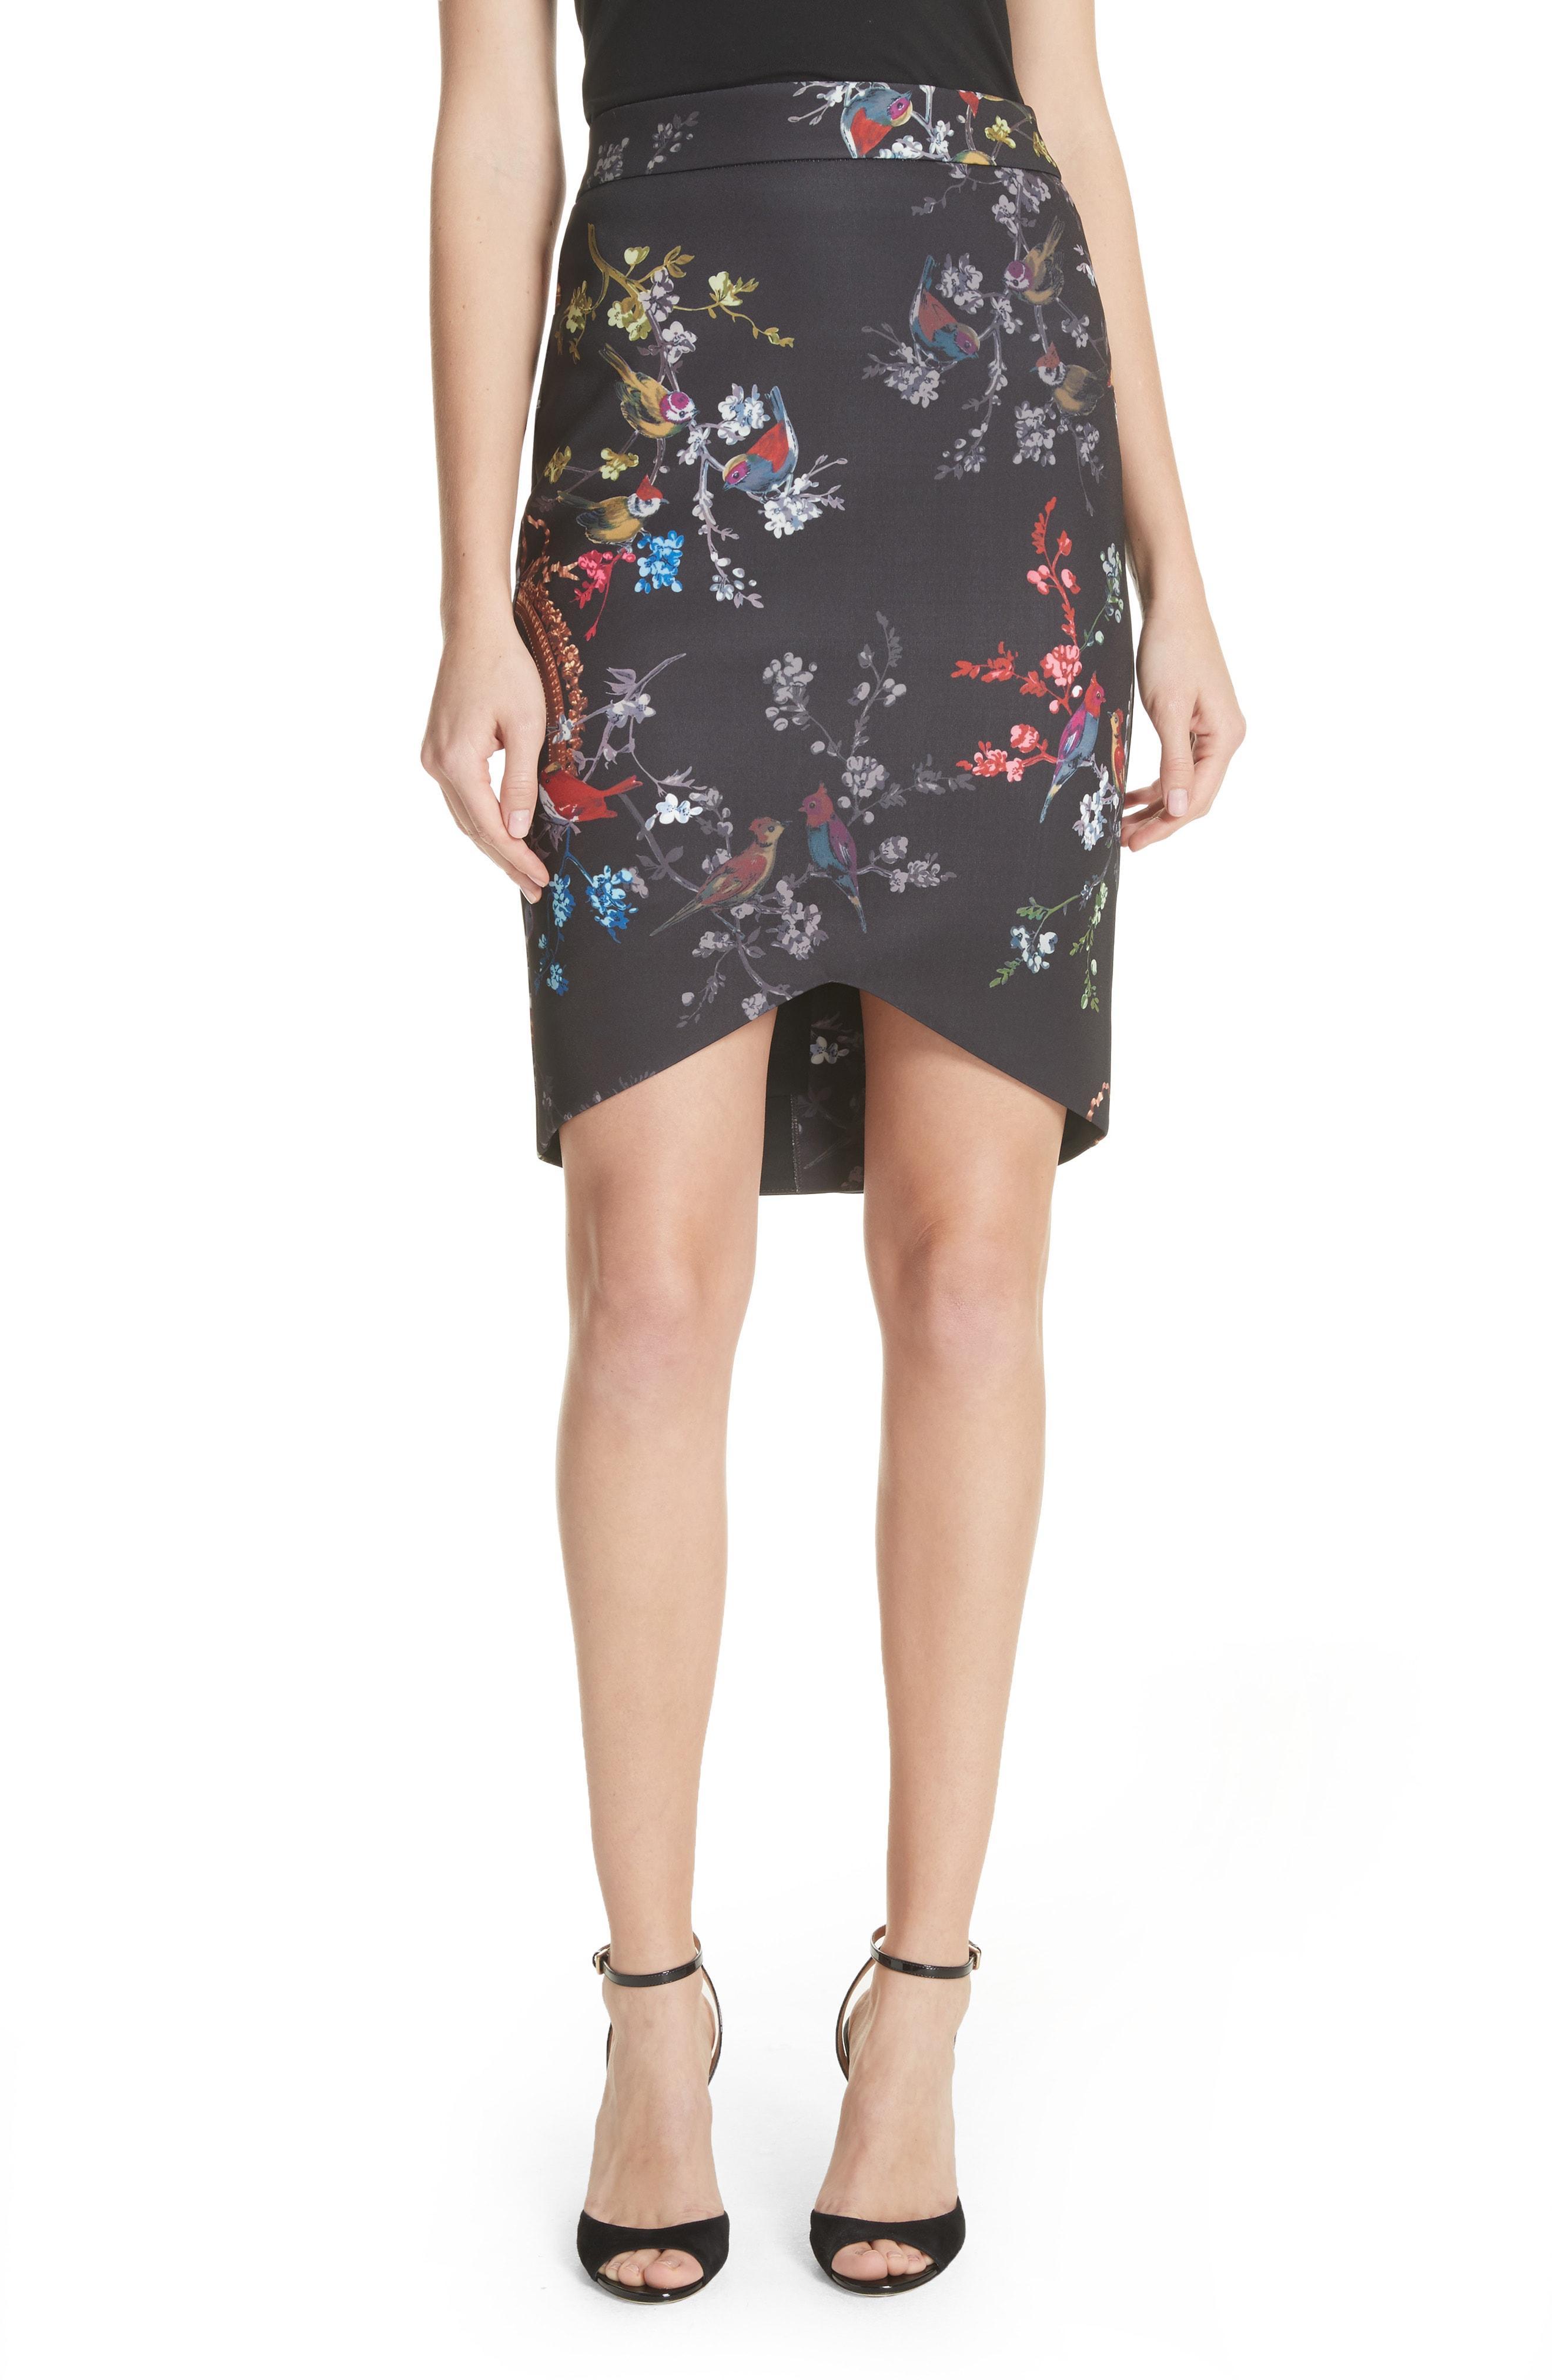 33d30f70d243 Ted Baker Opulent Fauna Pencil Skirt In Black